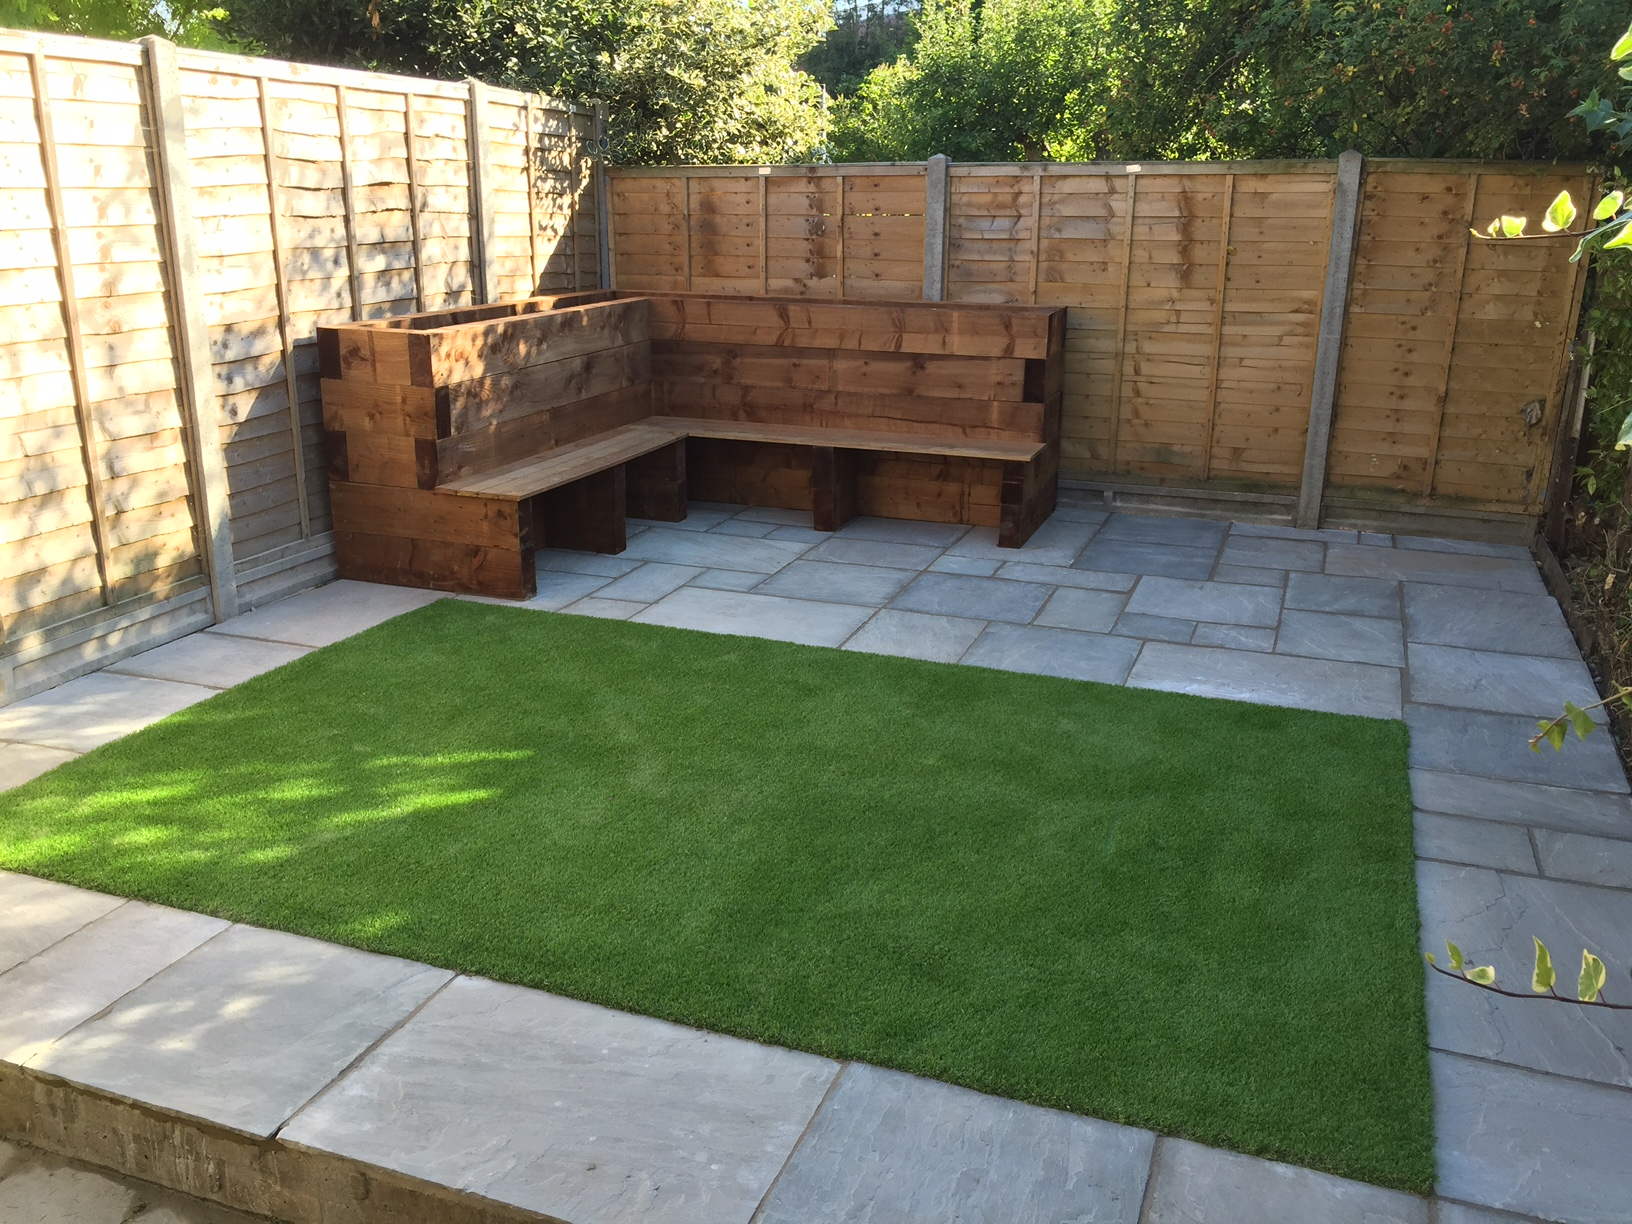 Tag: Garden Gardening South Woodford Design Patio Artificial Grass